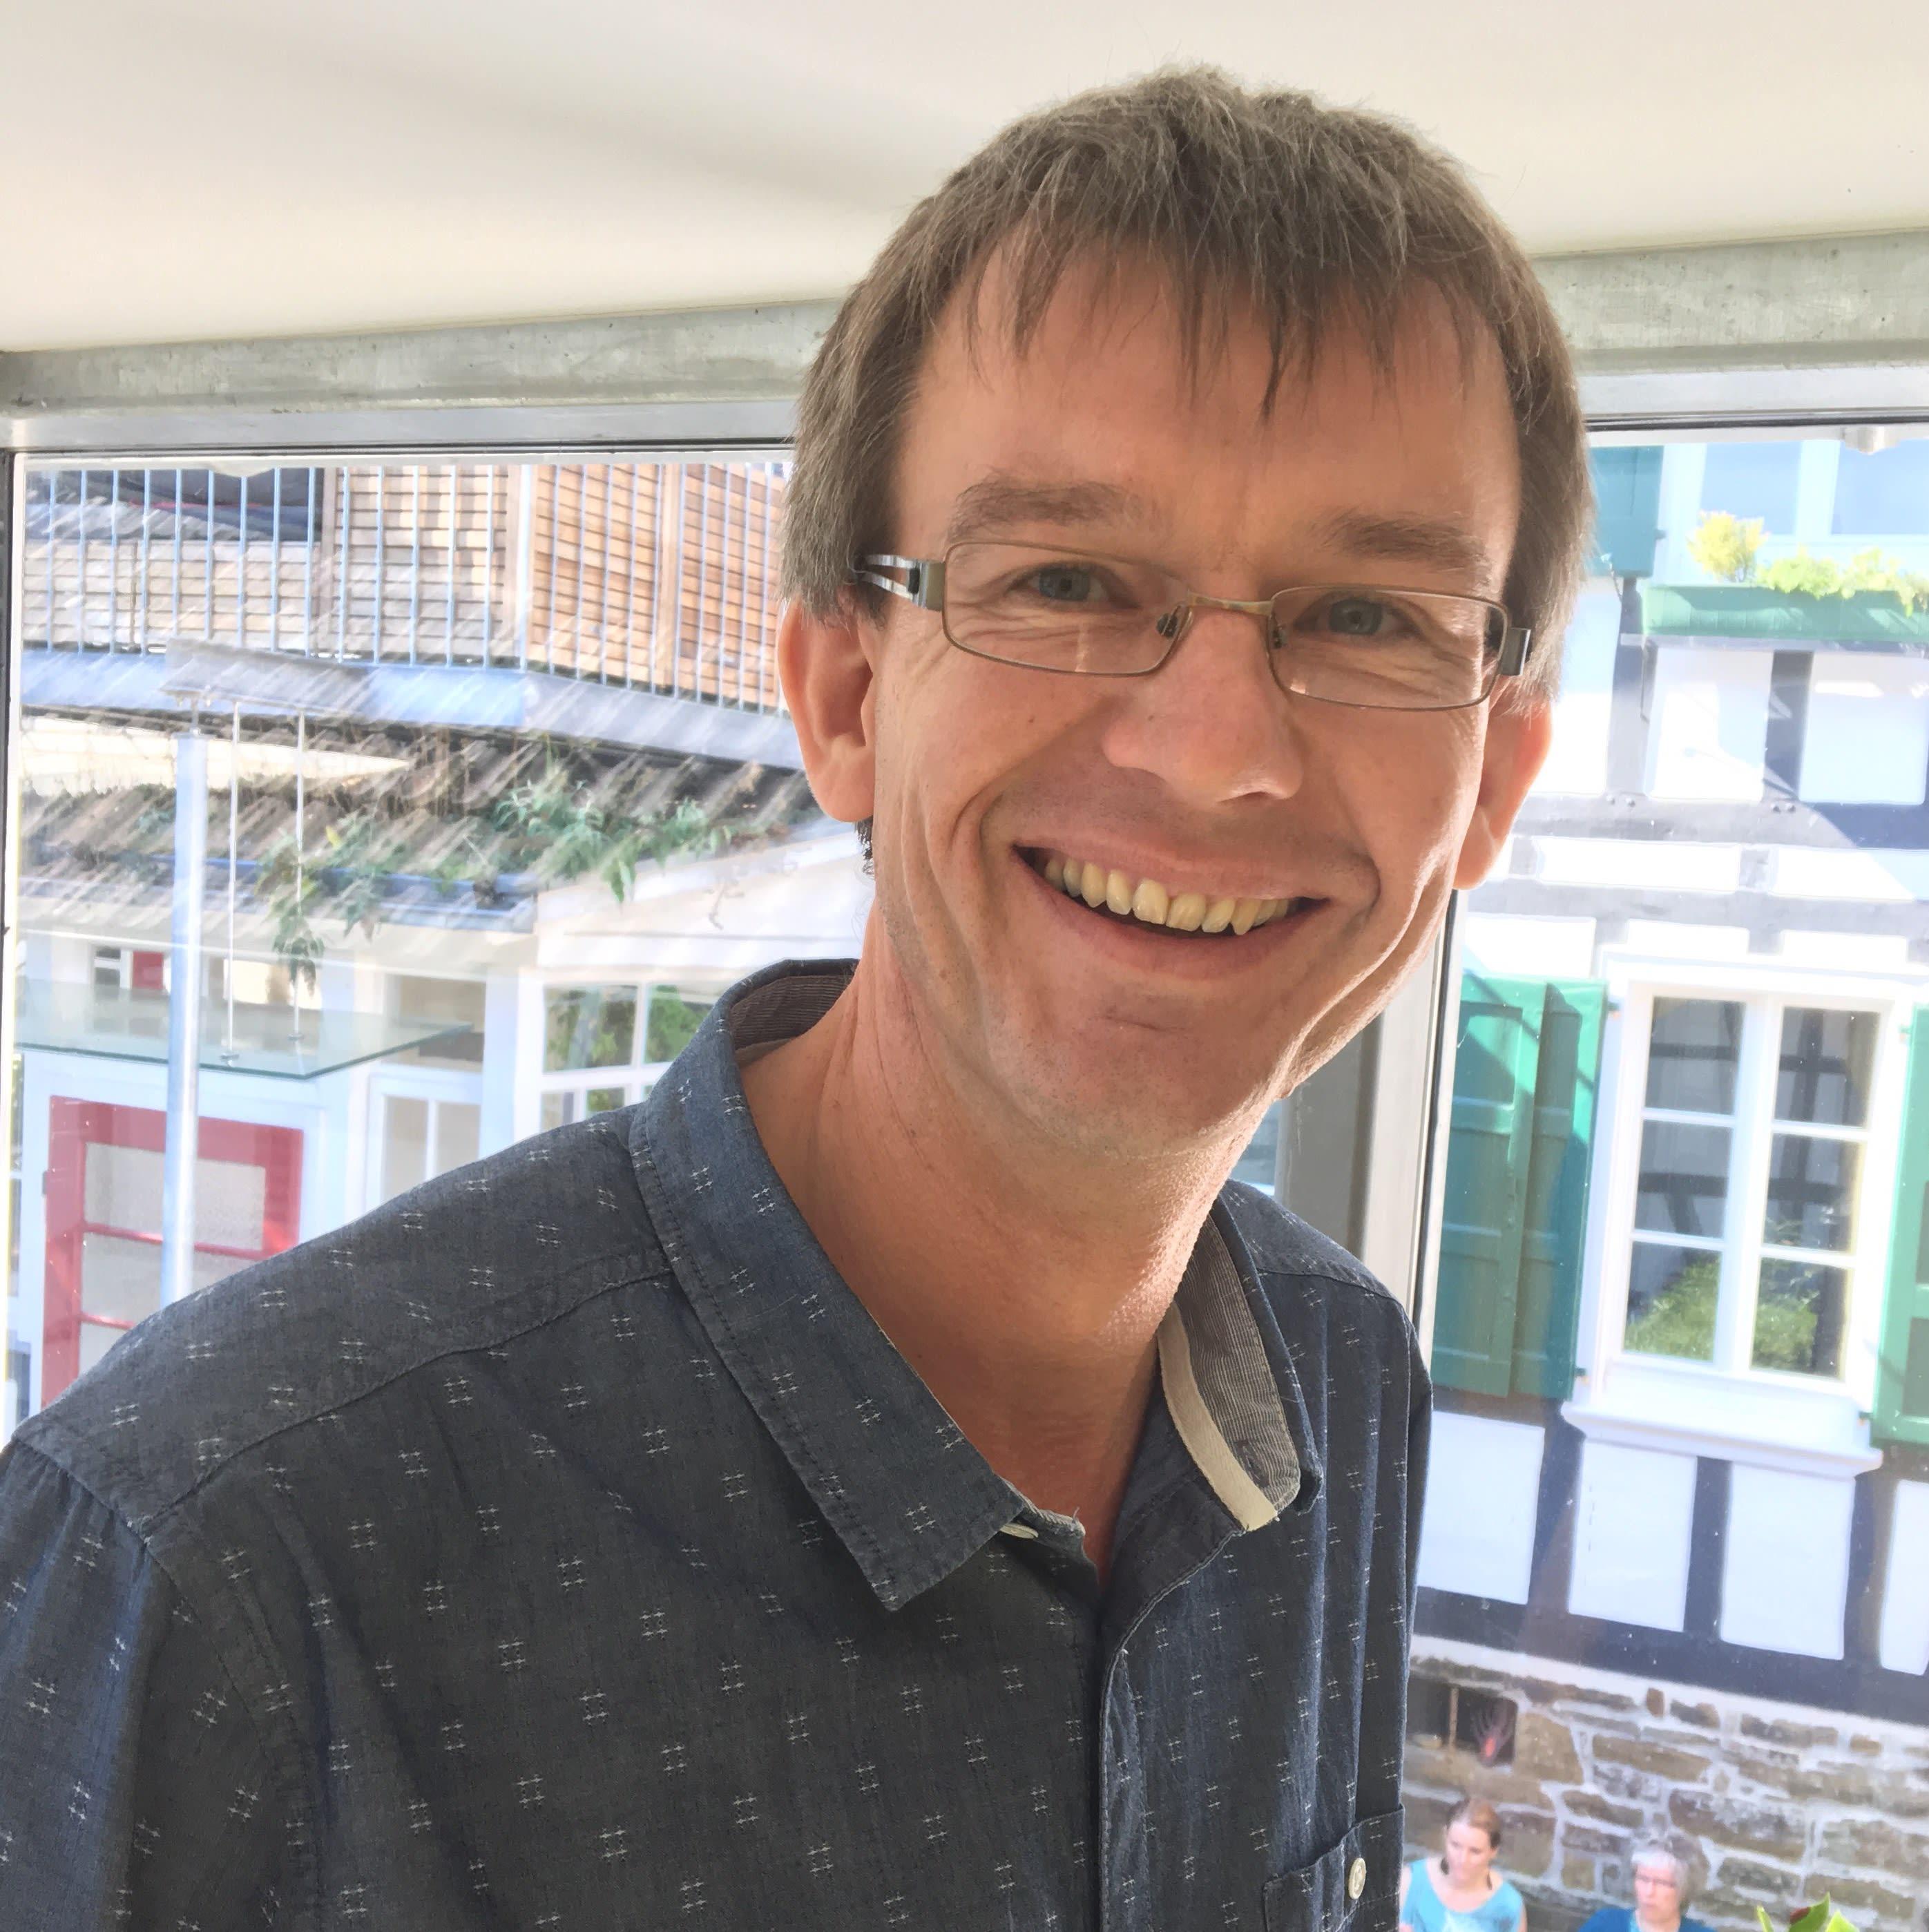 Markus Hermanns